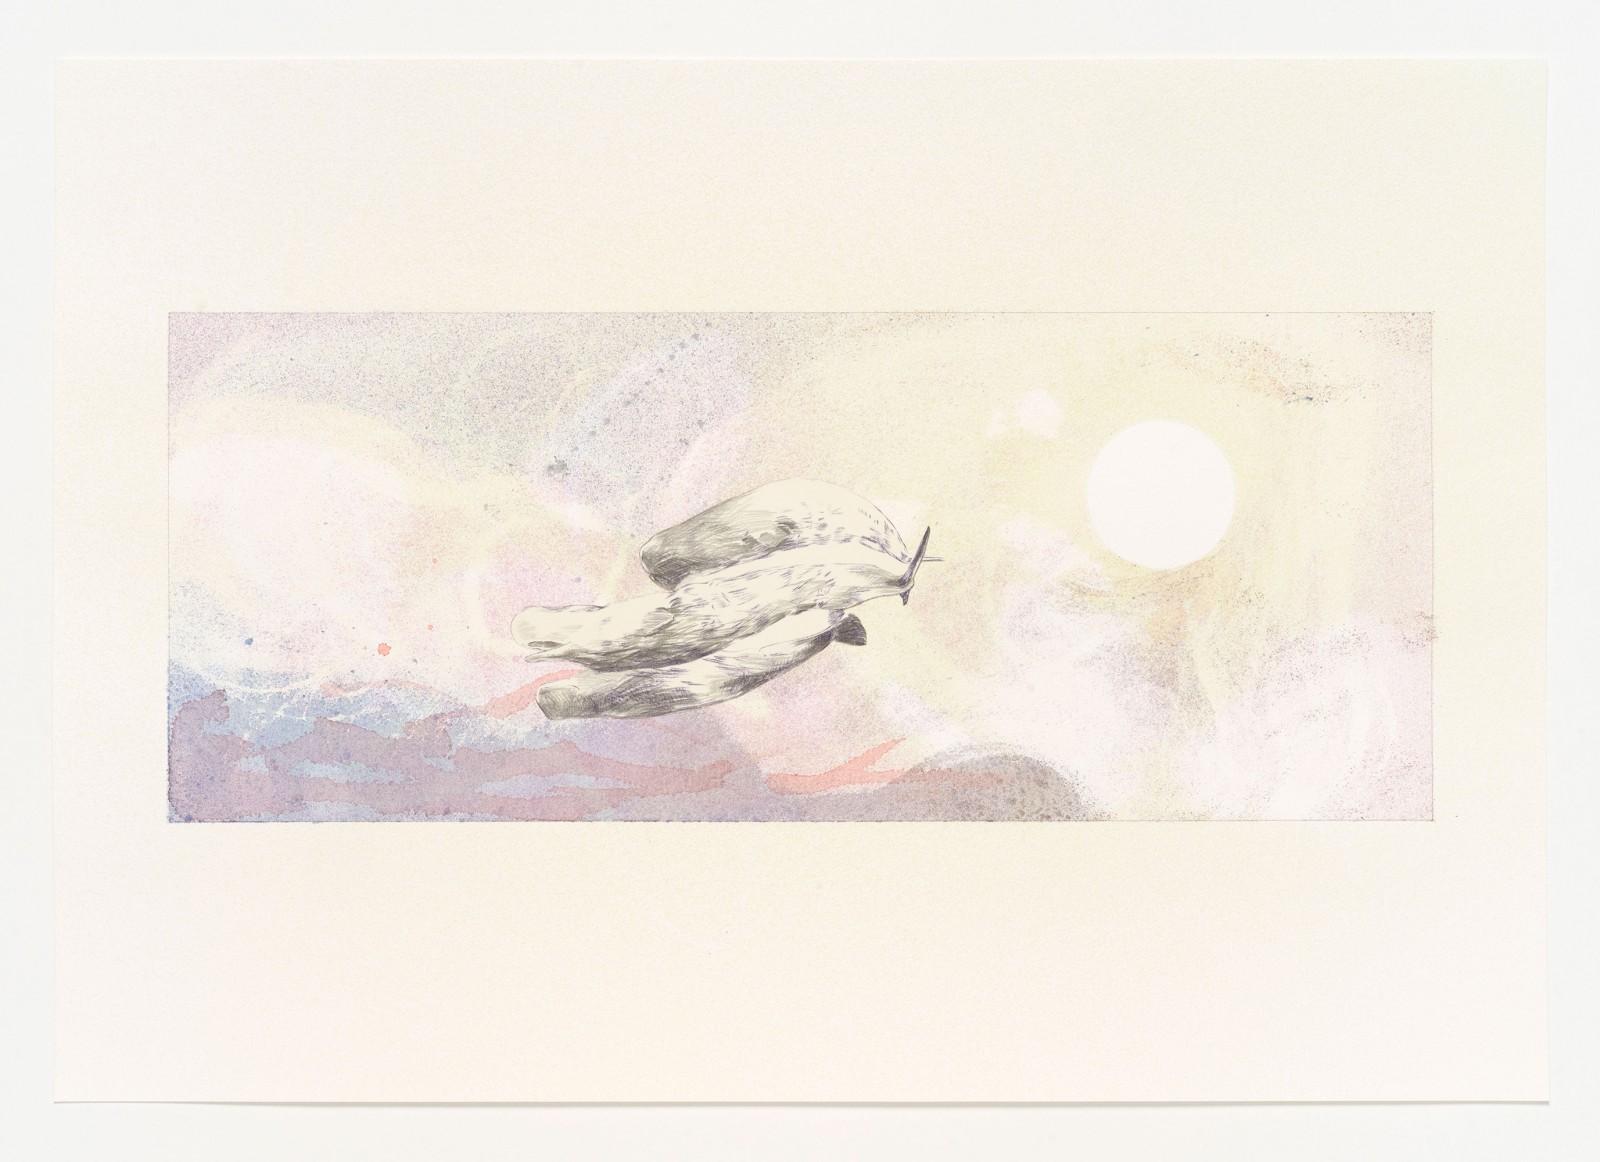 Kim Nekarda: untitled, 2019, carbon, pencil & watercolour on paper, 41 x 59 cm